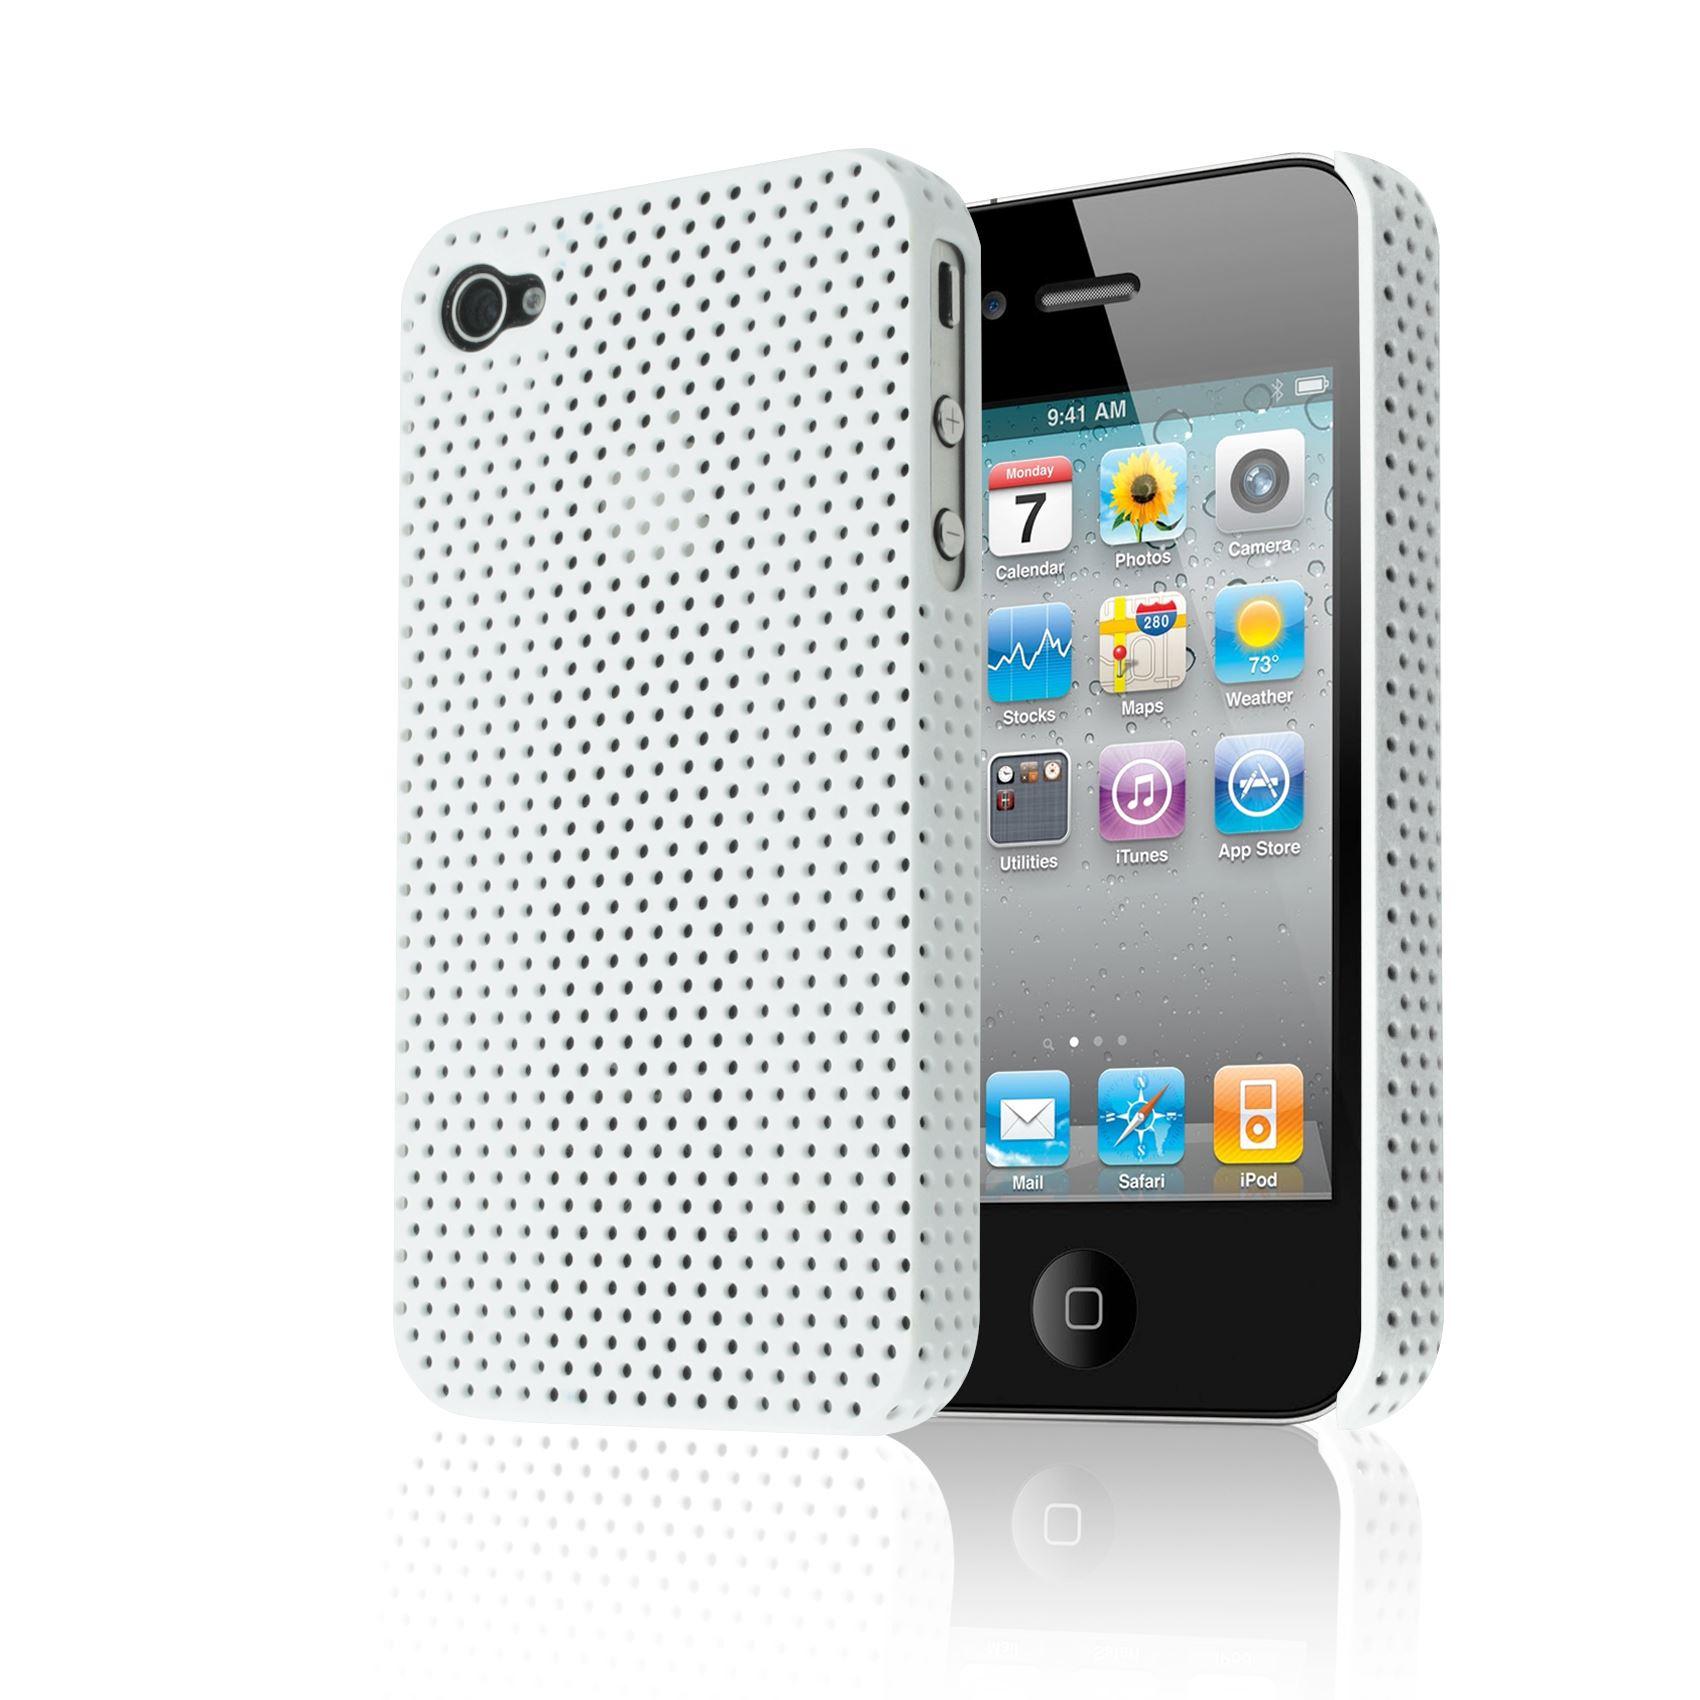 PERFORE-MAILLE-ETUI-IMPACT-MAT-COUVERCLE-BOITIER-PLASTIC-CASE-POUR-IPHONE-4S-4